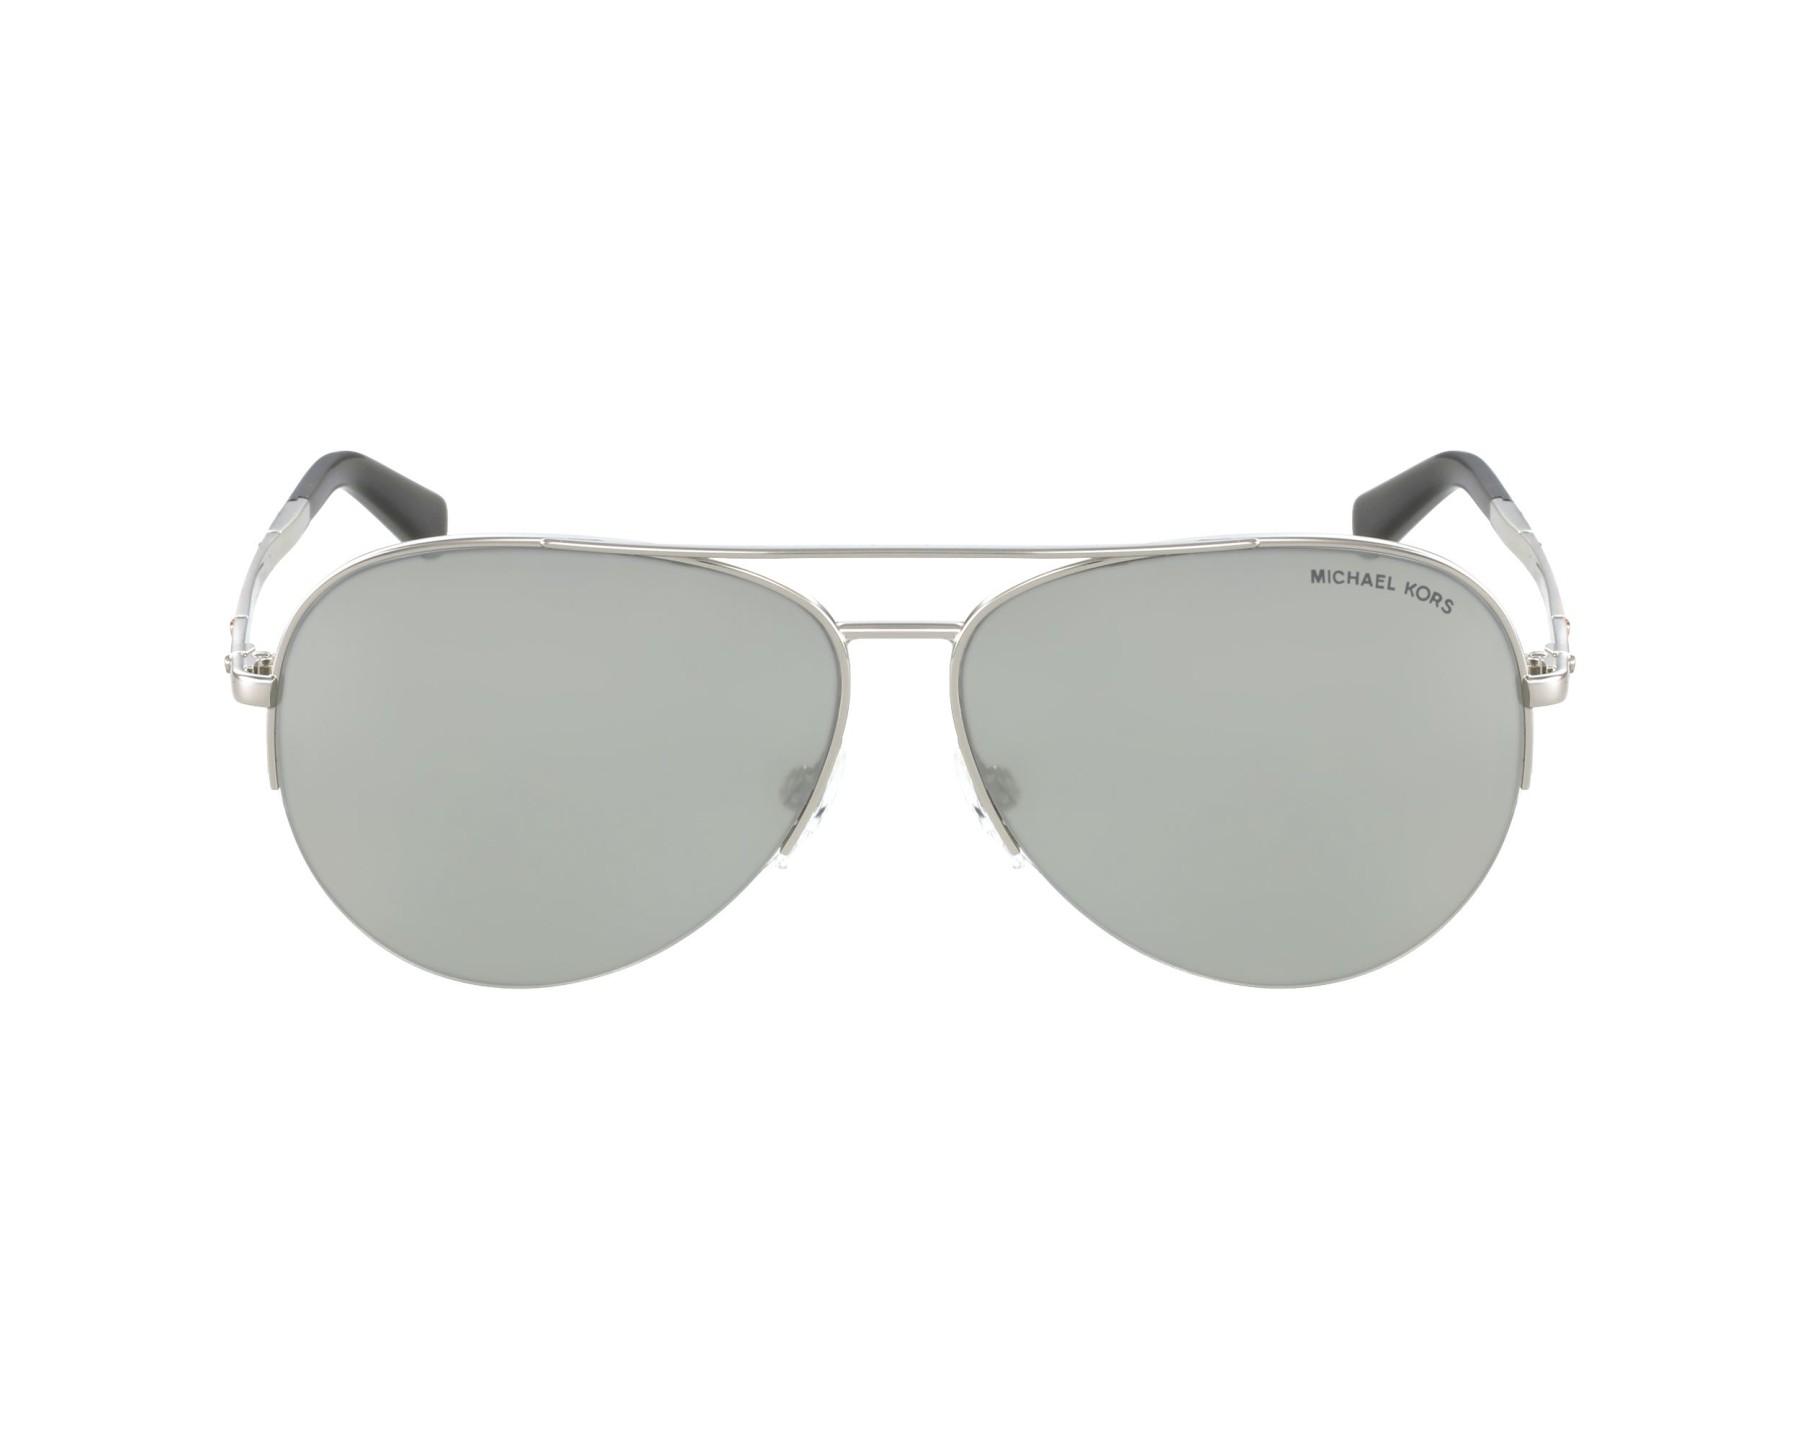 c3548912bcc5b Sunglasses Michael Kors MK-1001 100145 - Silver profile view